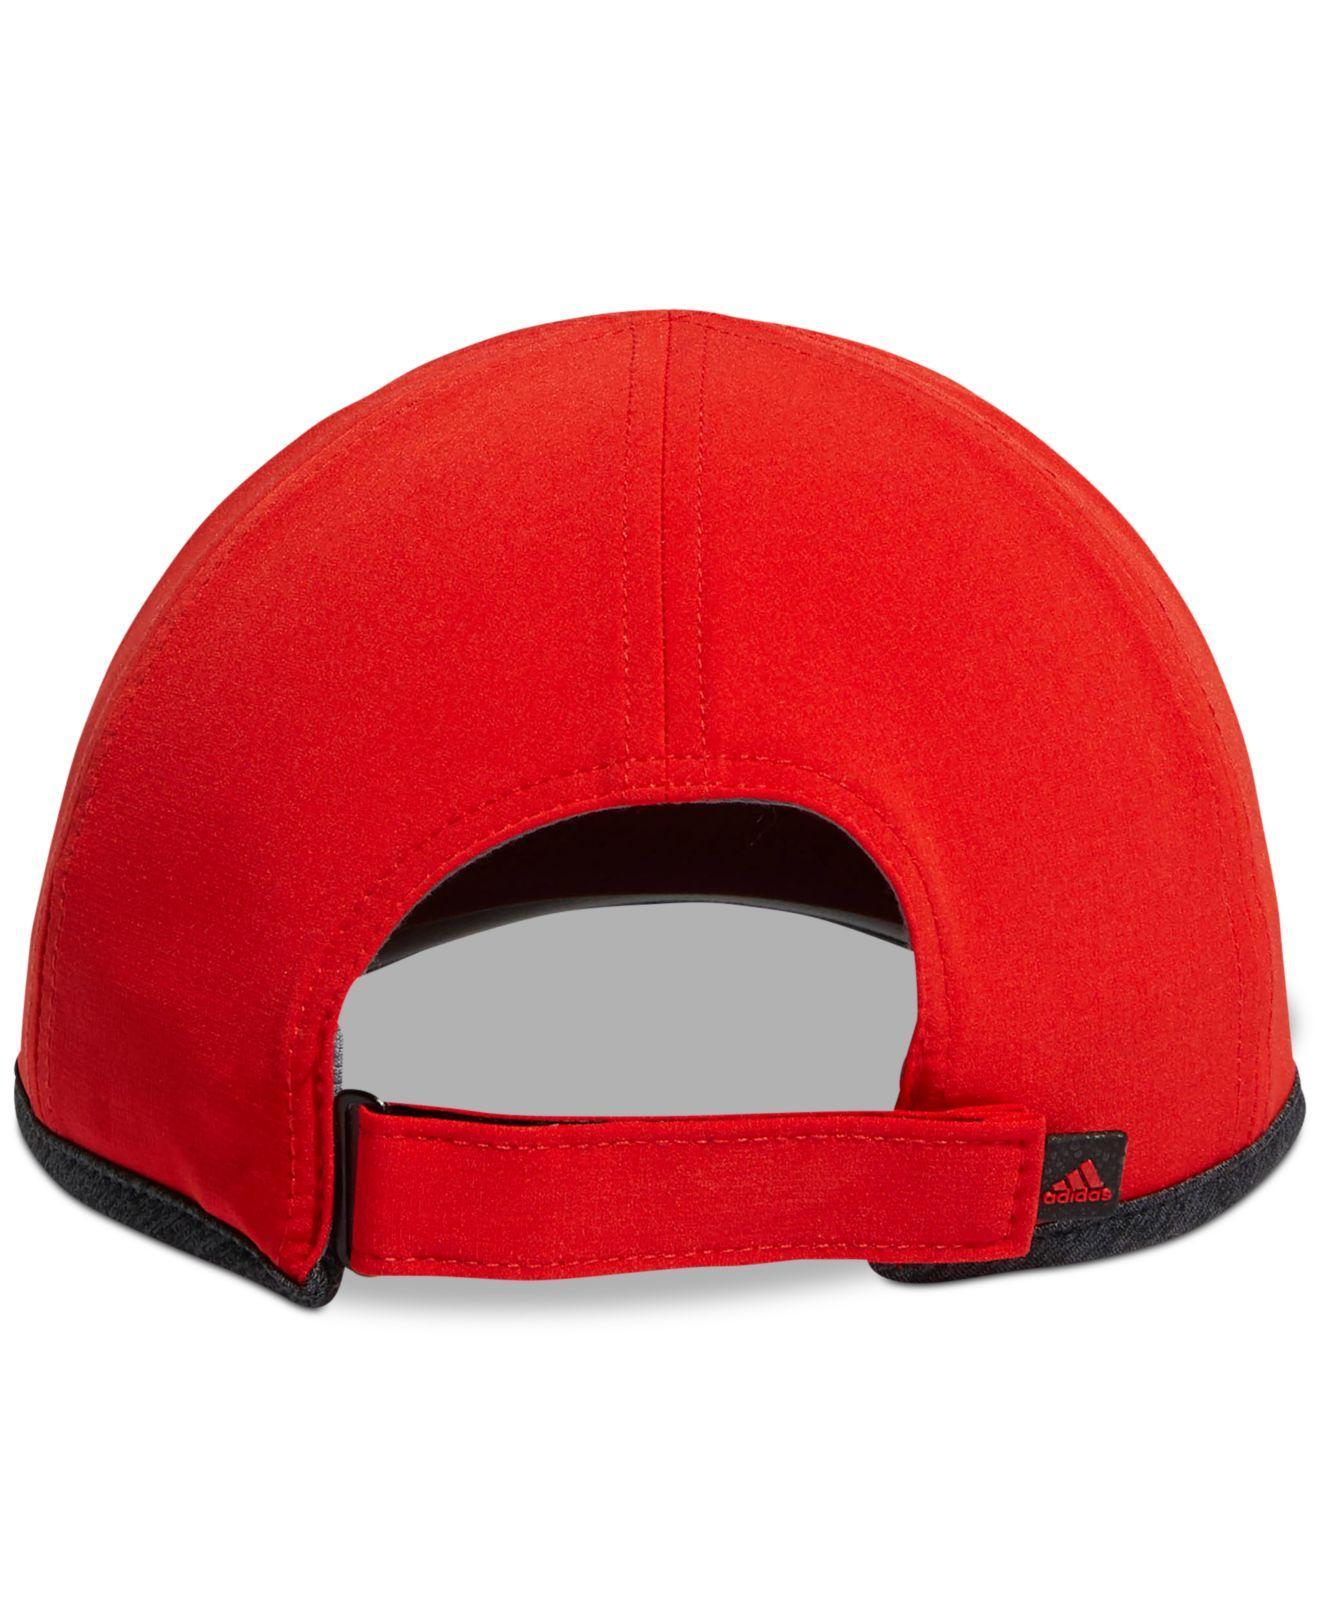 8fae6d74956a Lyst - adidas Adizero Superlite Hat in Red for Men